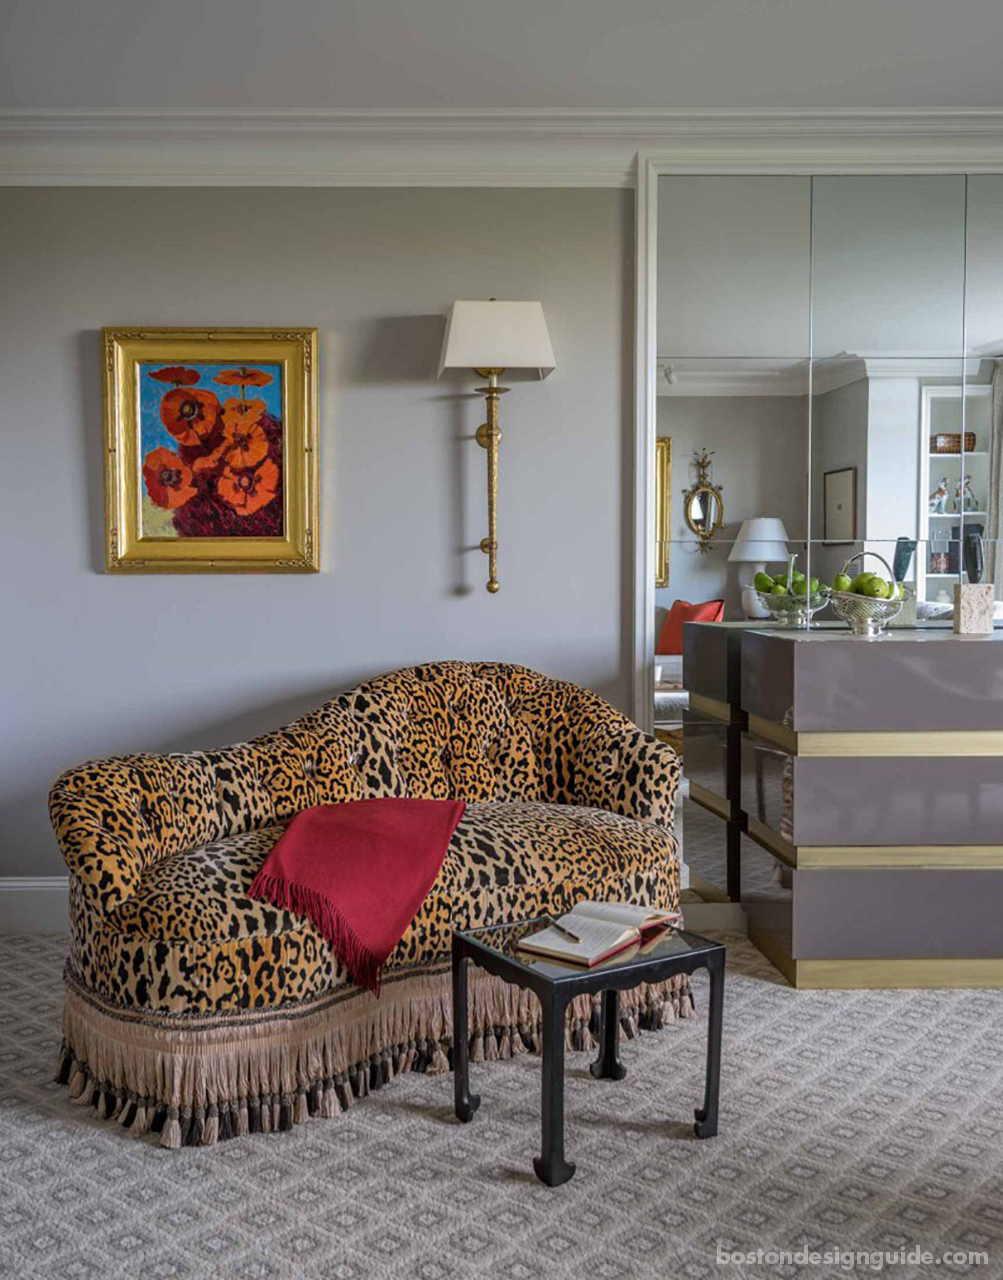 Animal prints in classic interiors